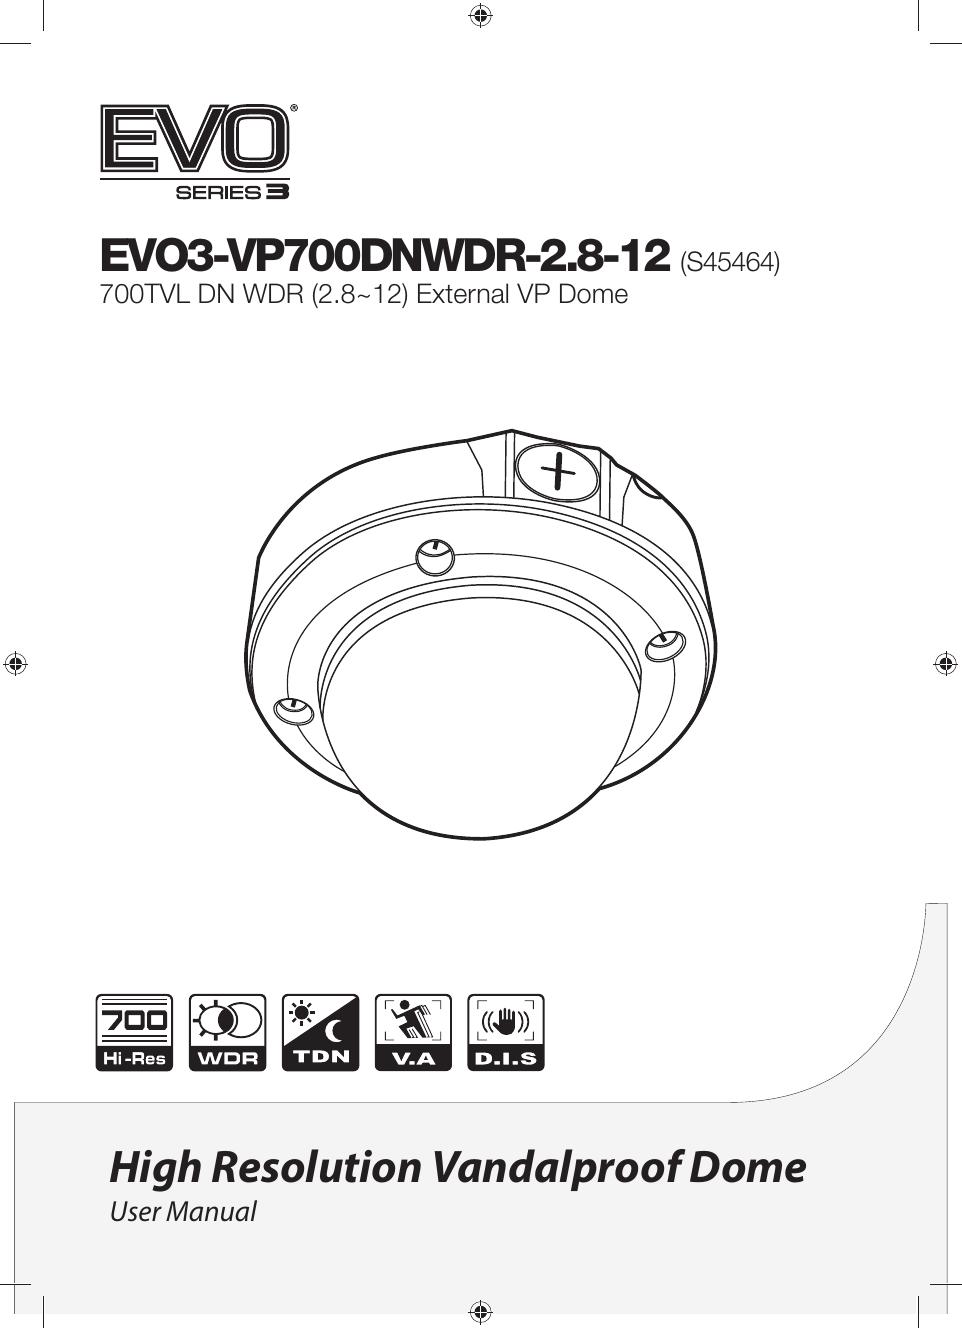 S45464 EVO3-VP700DNWDR-2.8-12 Manual V1.0.pdf | Manualzz